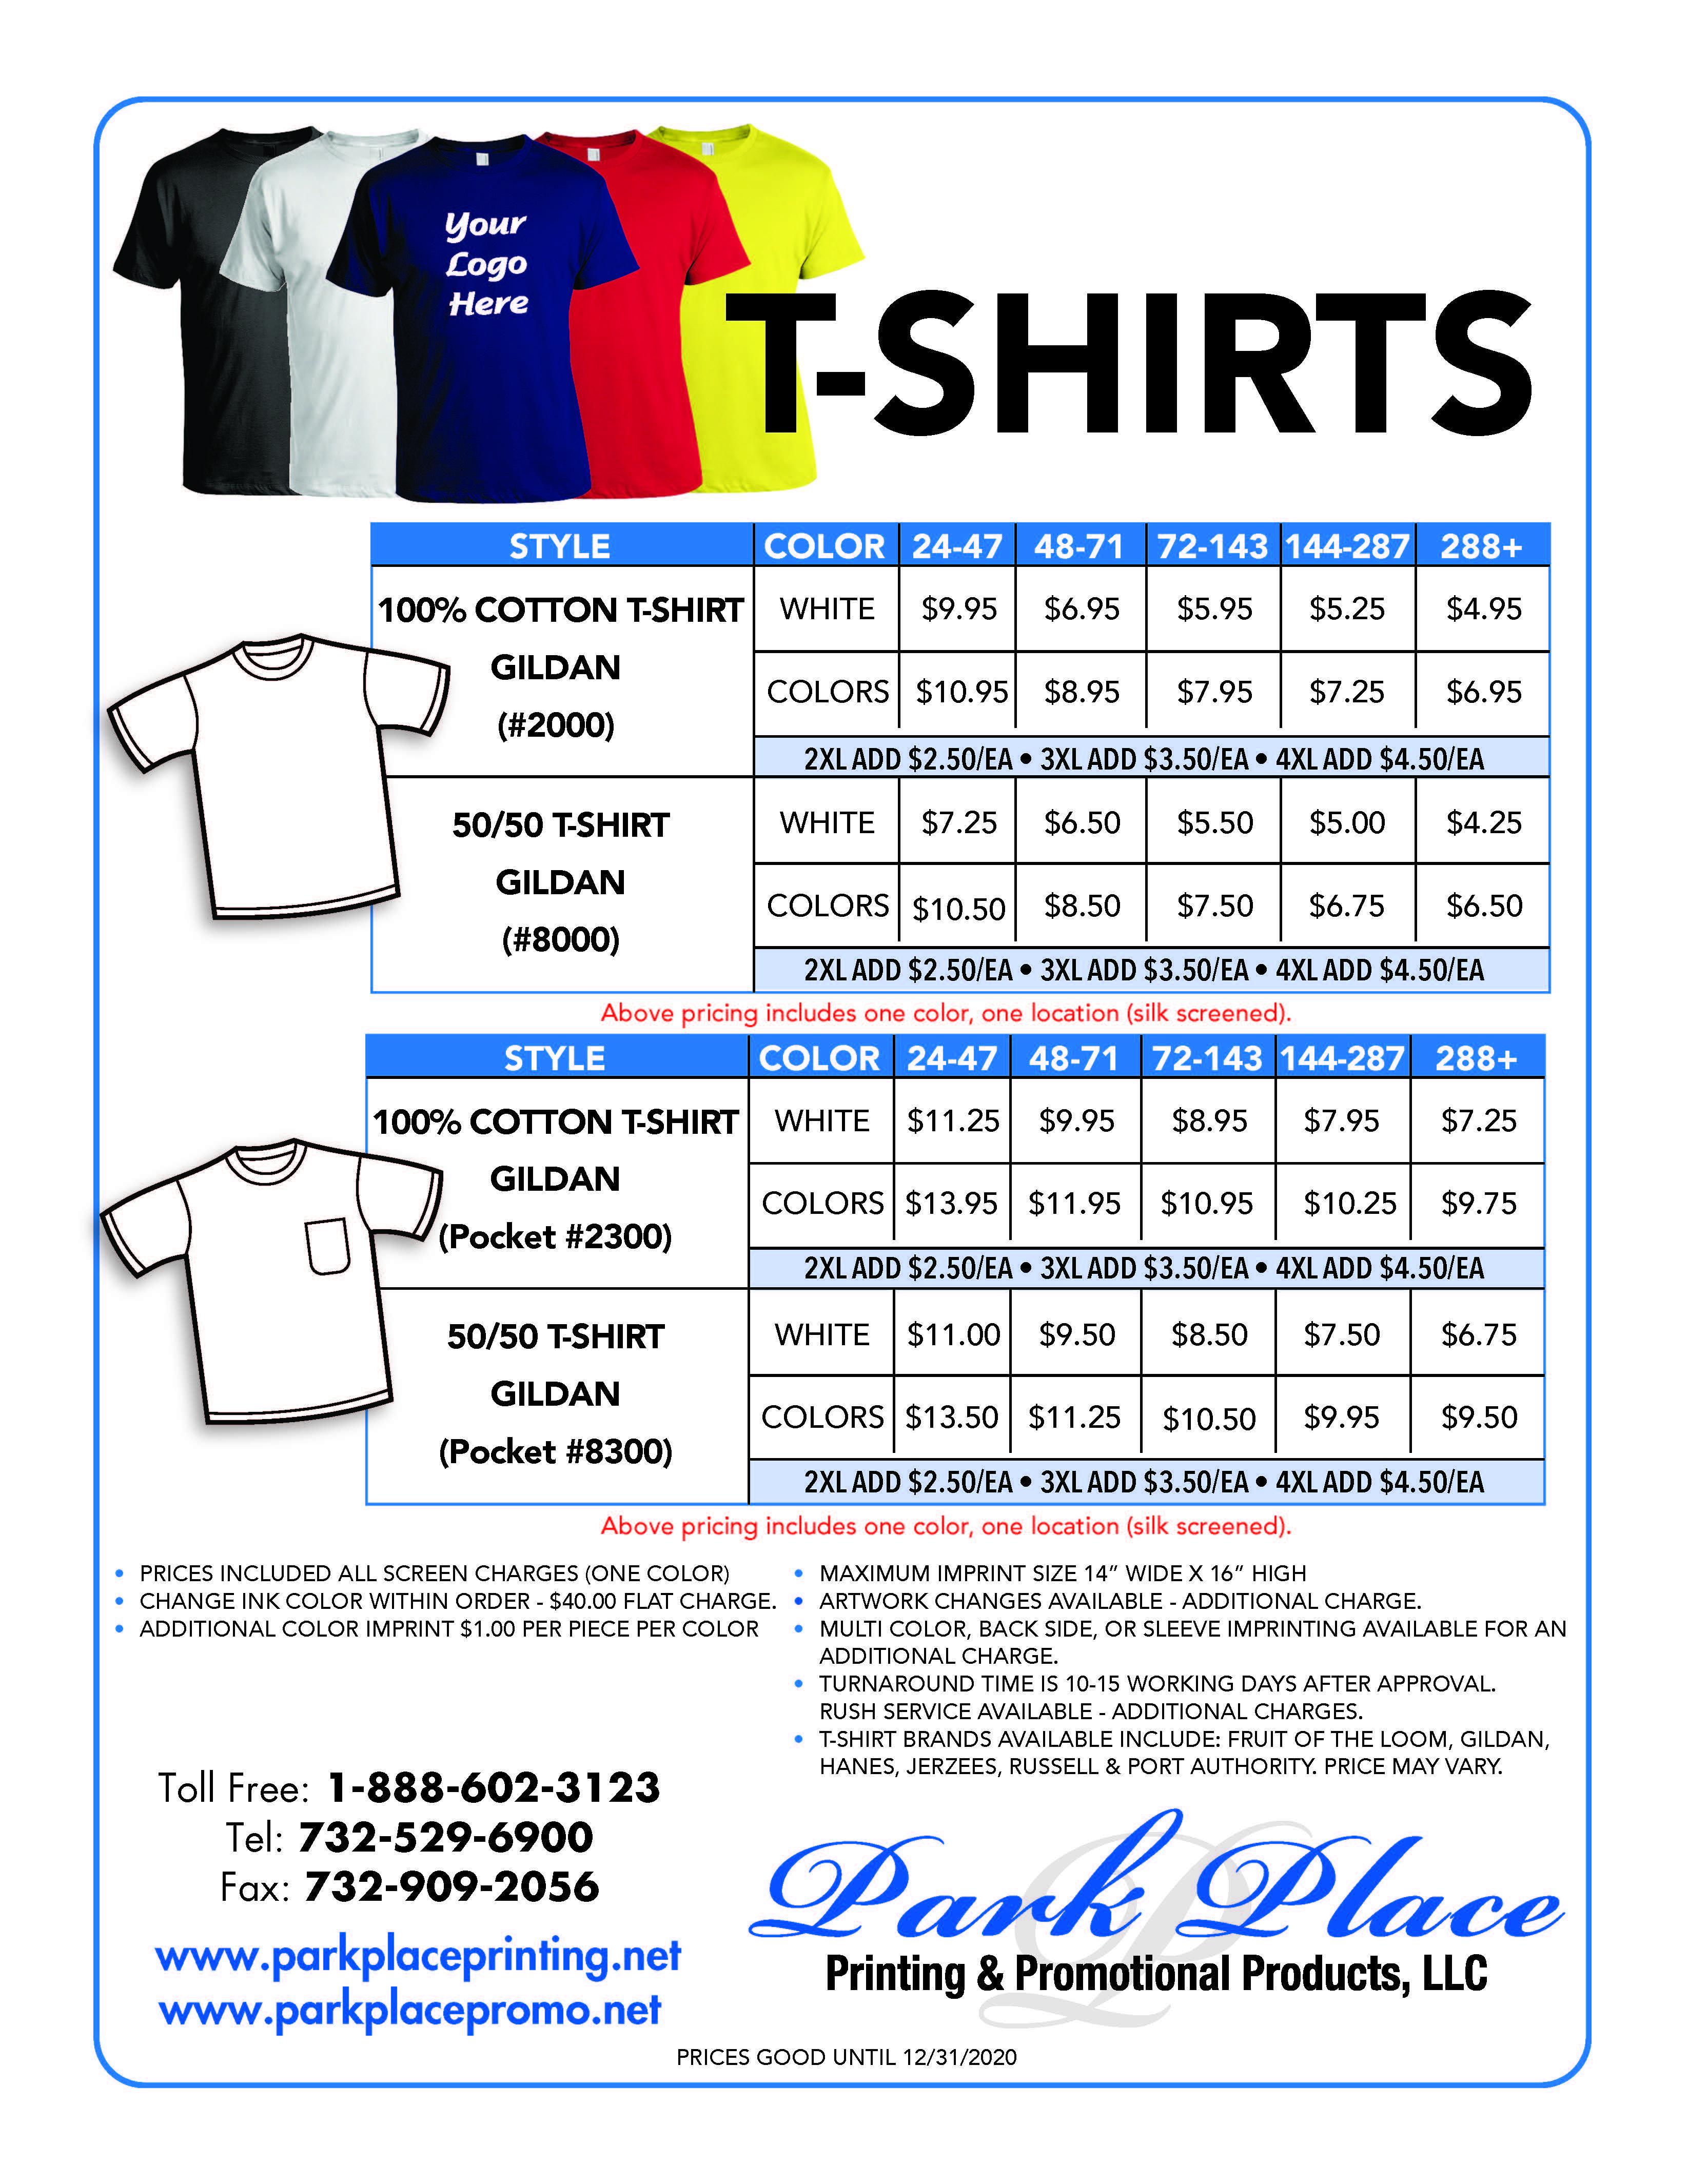 tshirts-flyer-2019.jpg